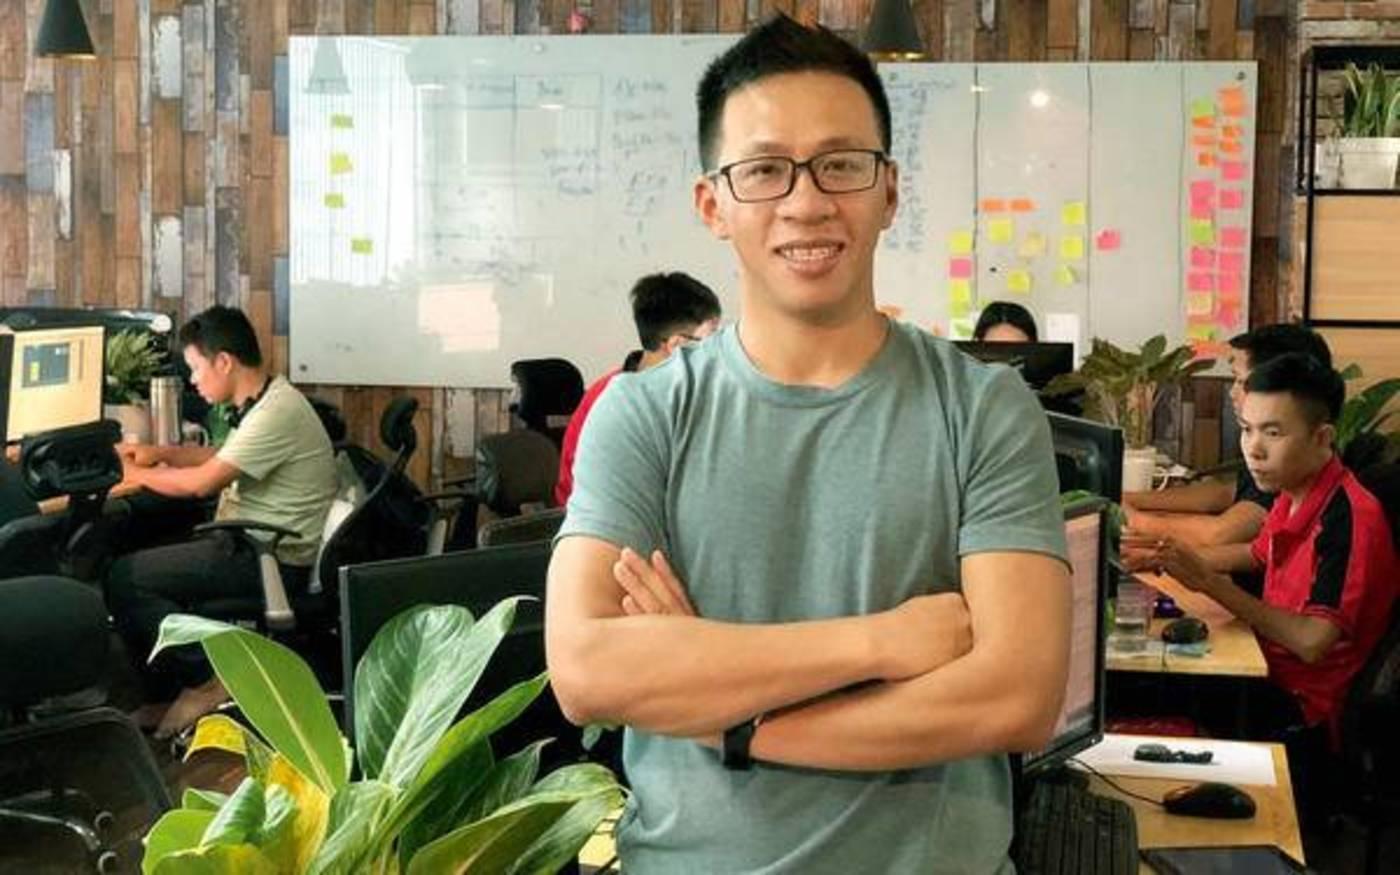 Wolffun Game CEO Nguyen Dinh Khanh